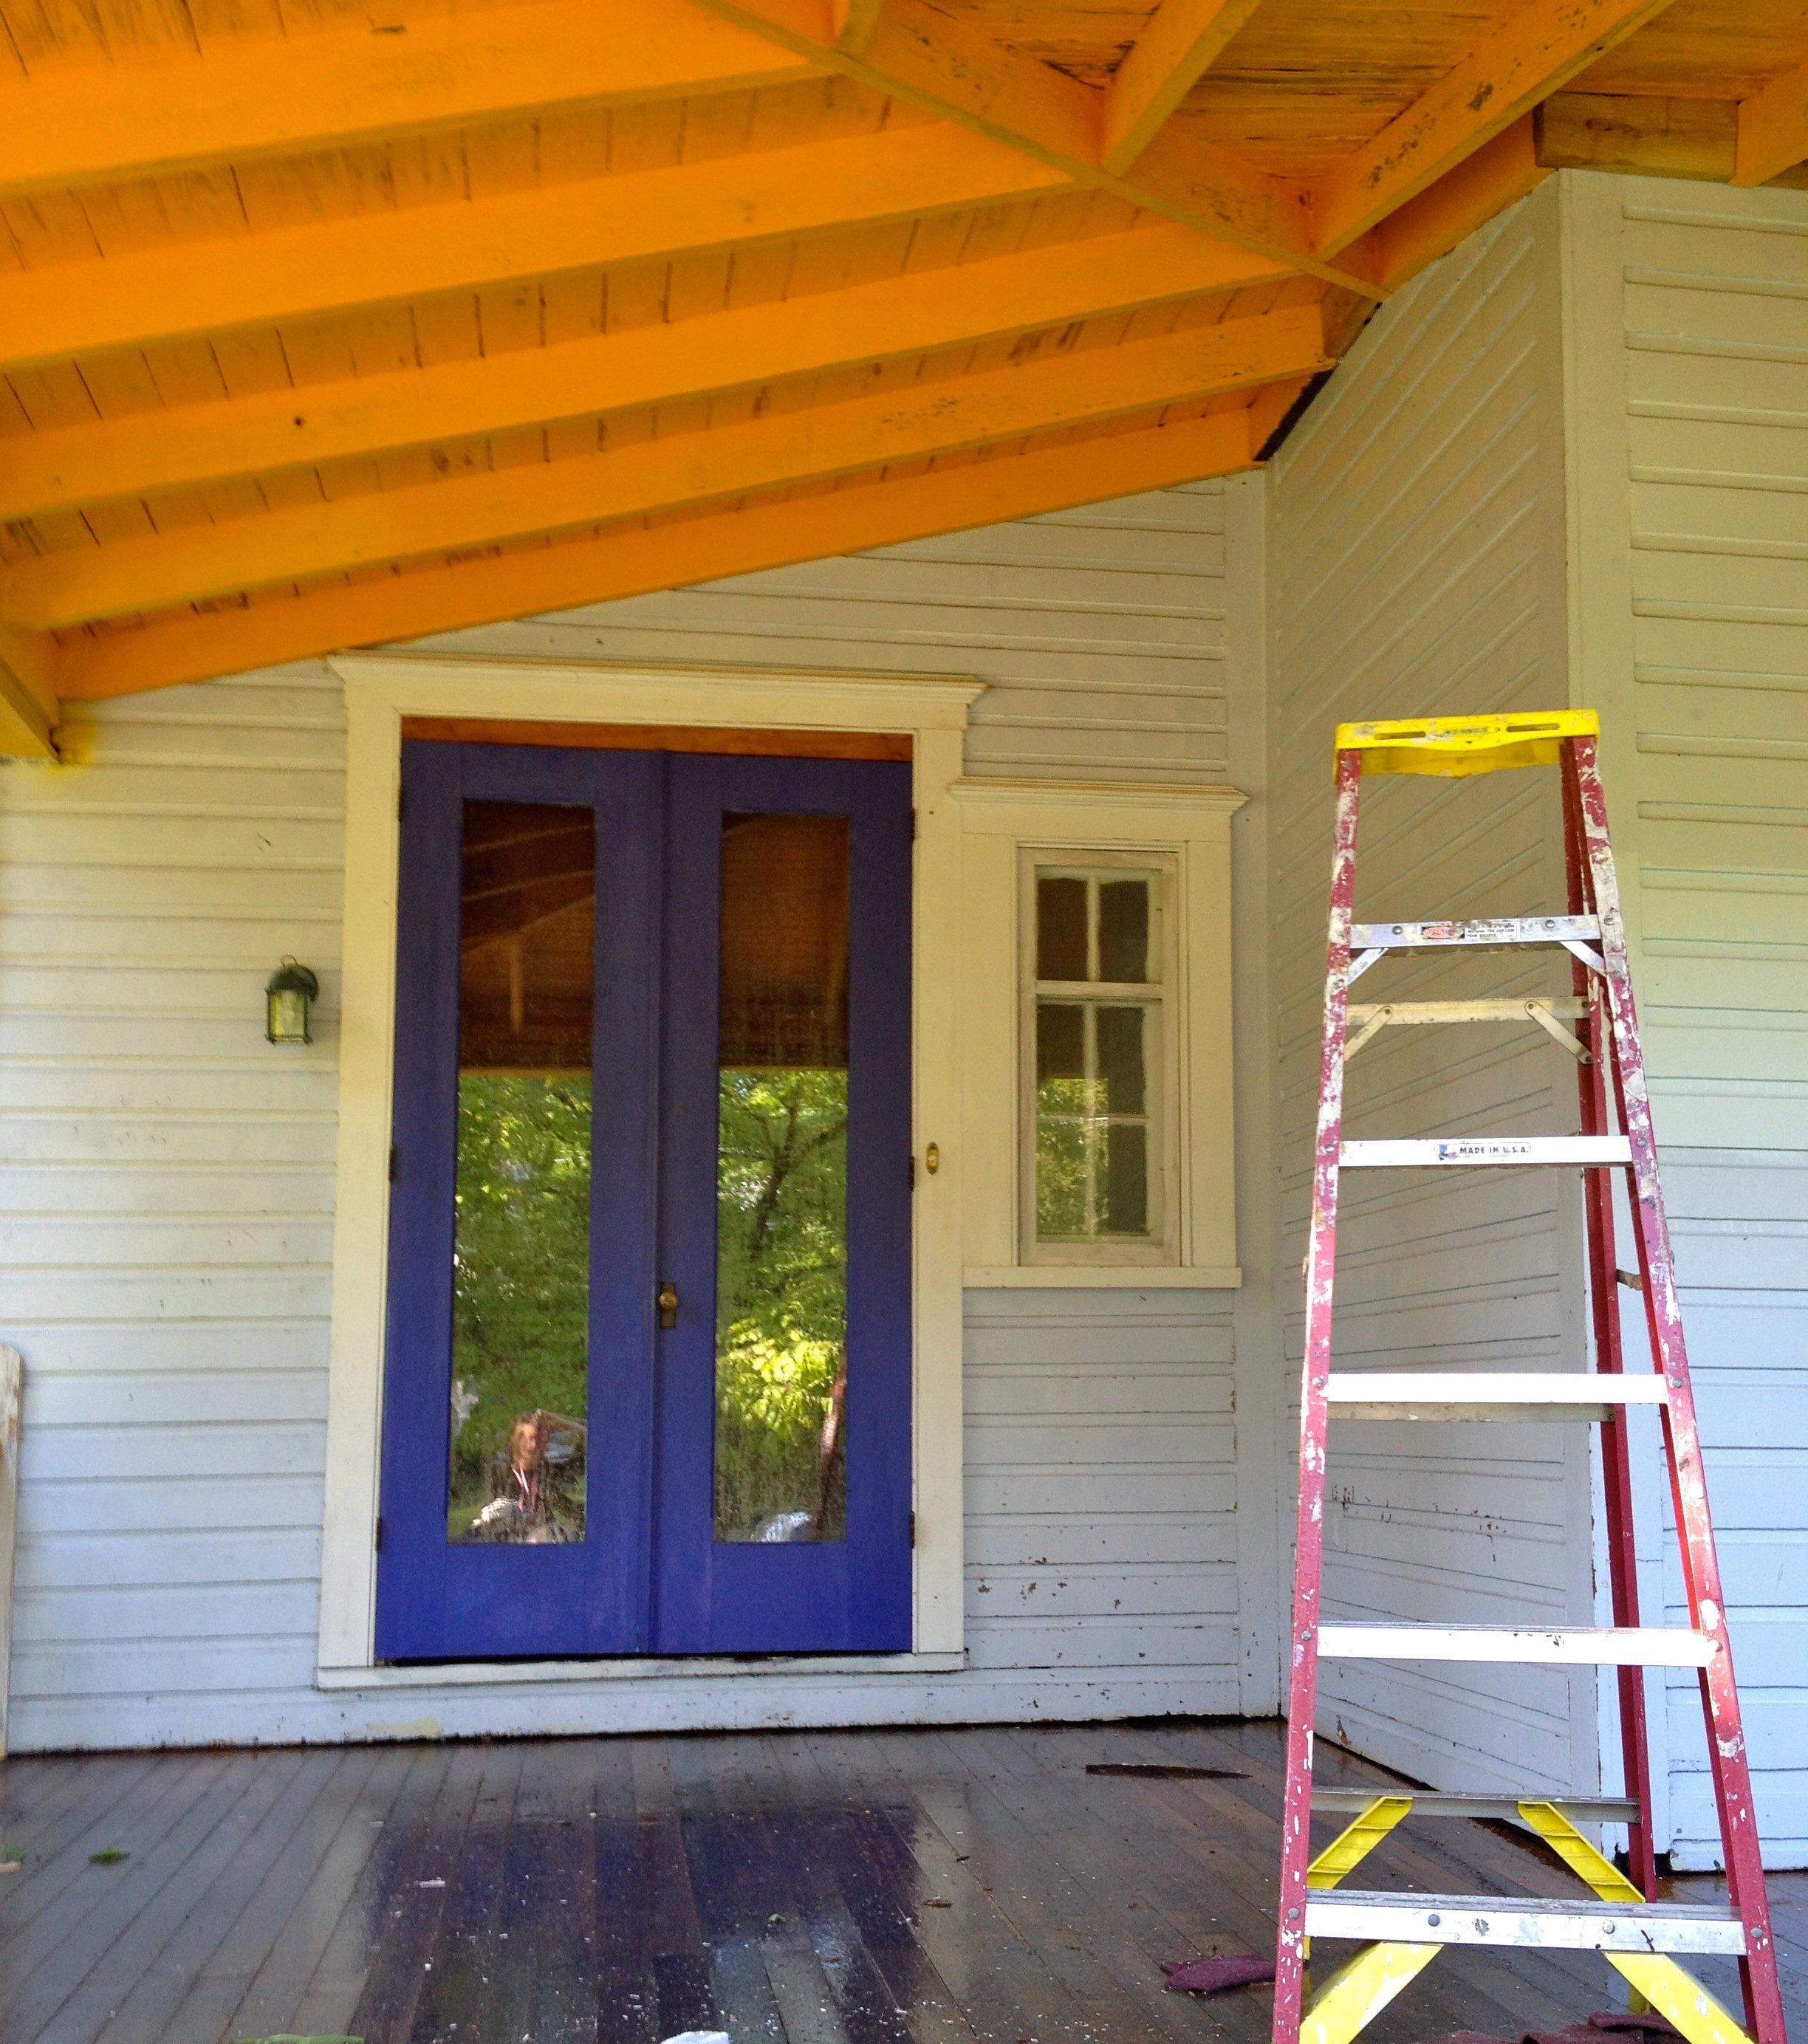 Victorian Wrap Around Porch Double Front Doors Crown Molding Over Entrance Color Choices Powerwash Siding Victoria Elizabeth Barnes